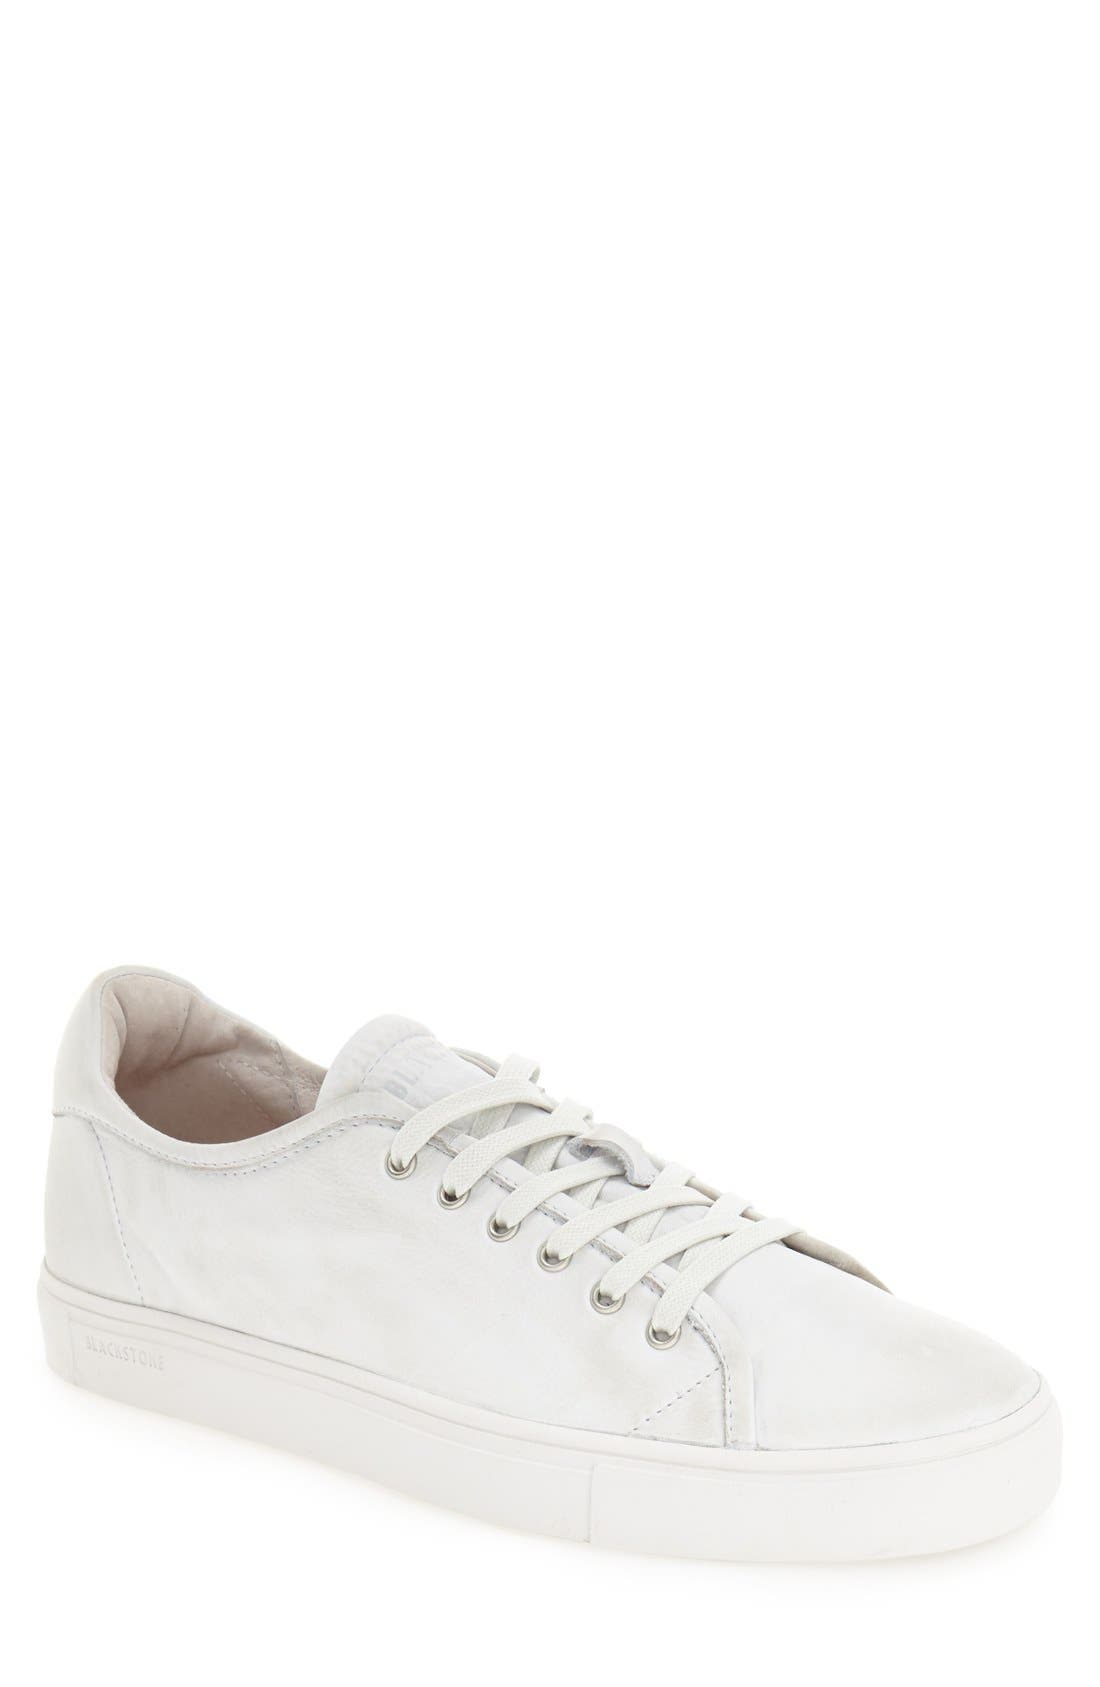 Blacktone 'LM24' Sneaker,                             Main thumbnail 1, color,                             White